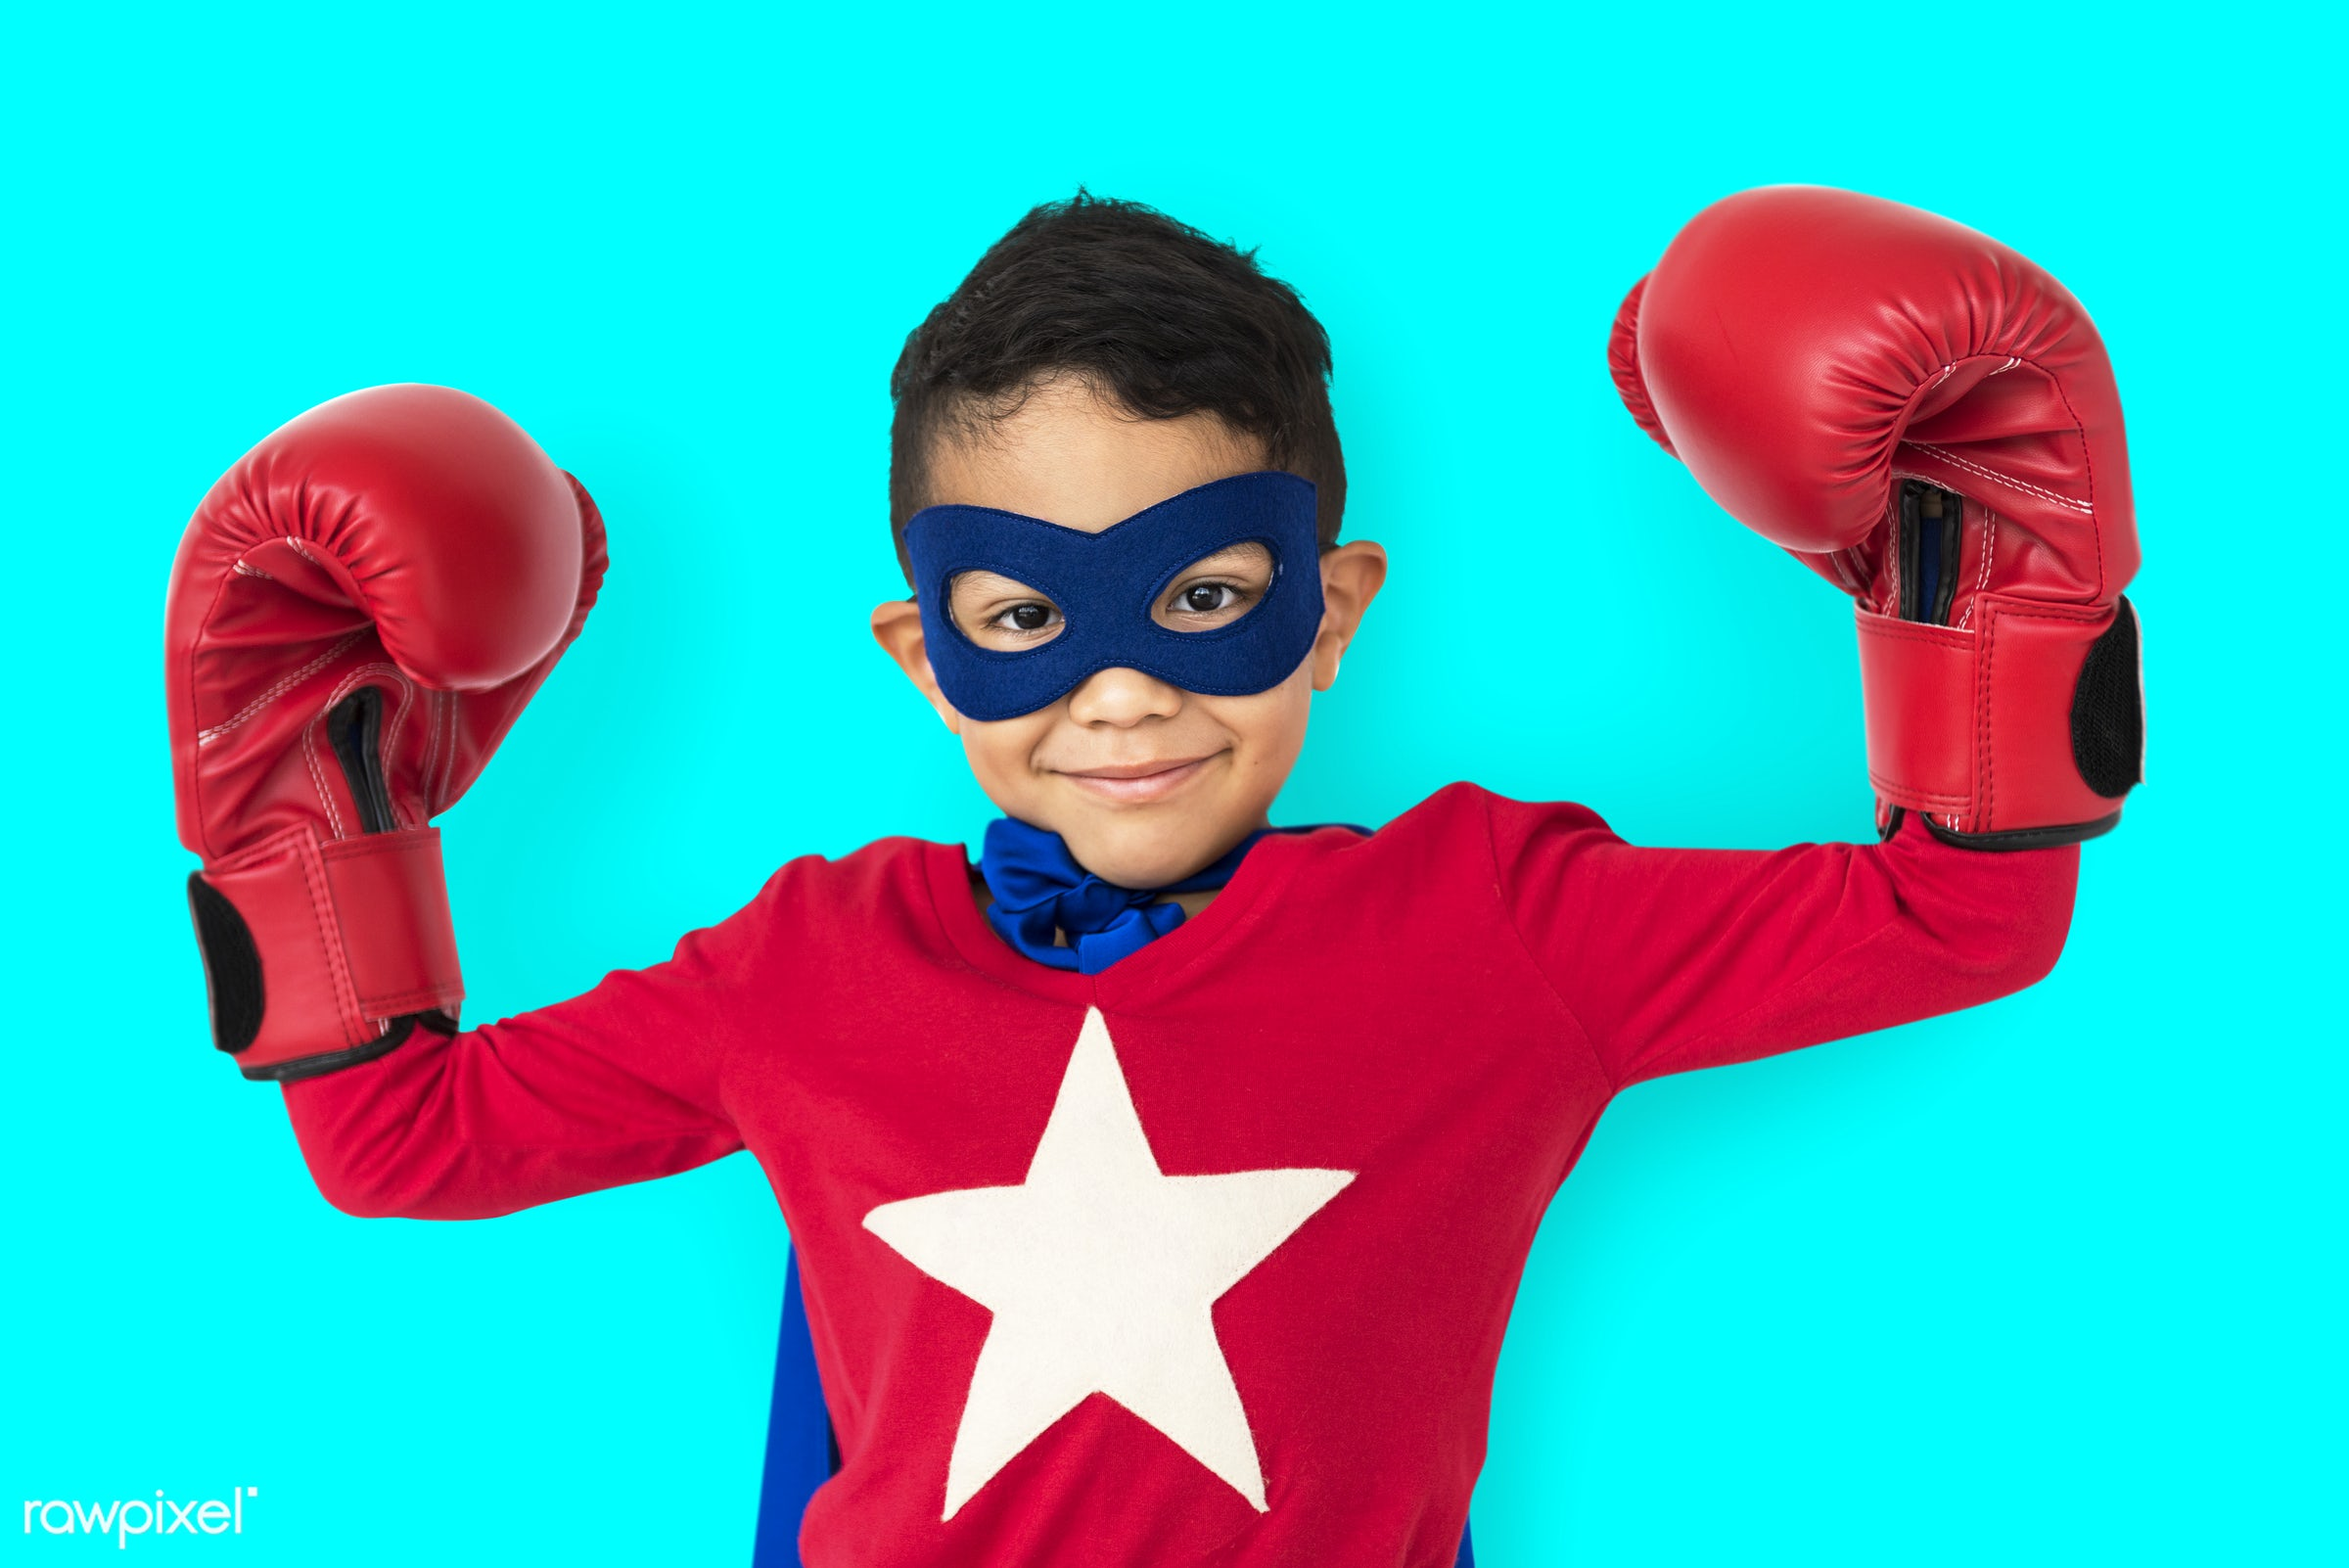 brave, people, adolescence, kid, bold, fearlessness, friends, inspiration, childhood, idol, unafraid, generation, gutsy,...